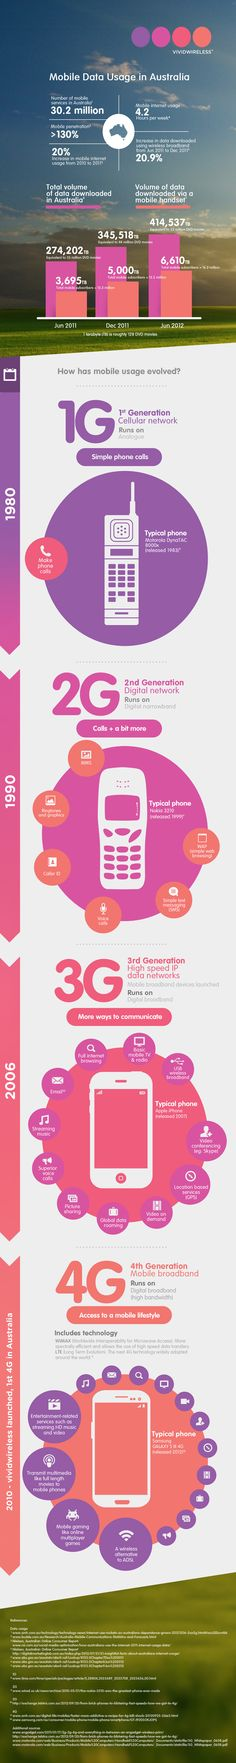 Infographics - Mobile Data Usage In Australia 2013